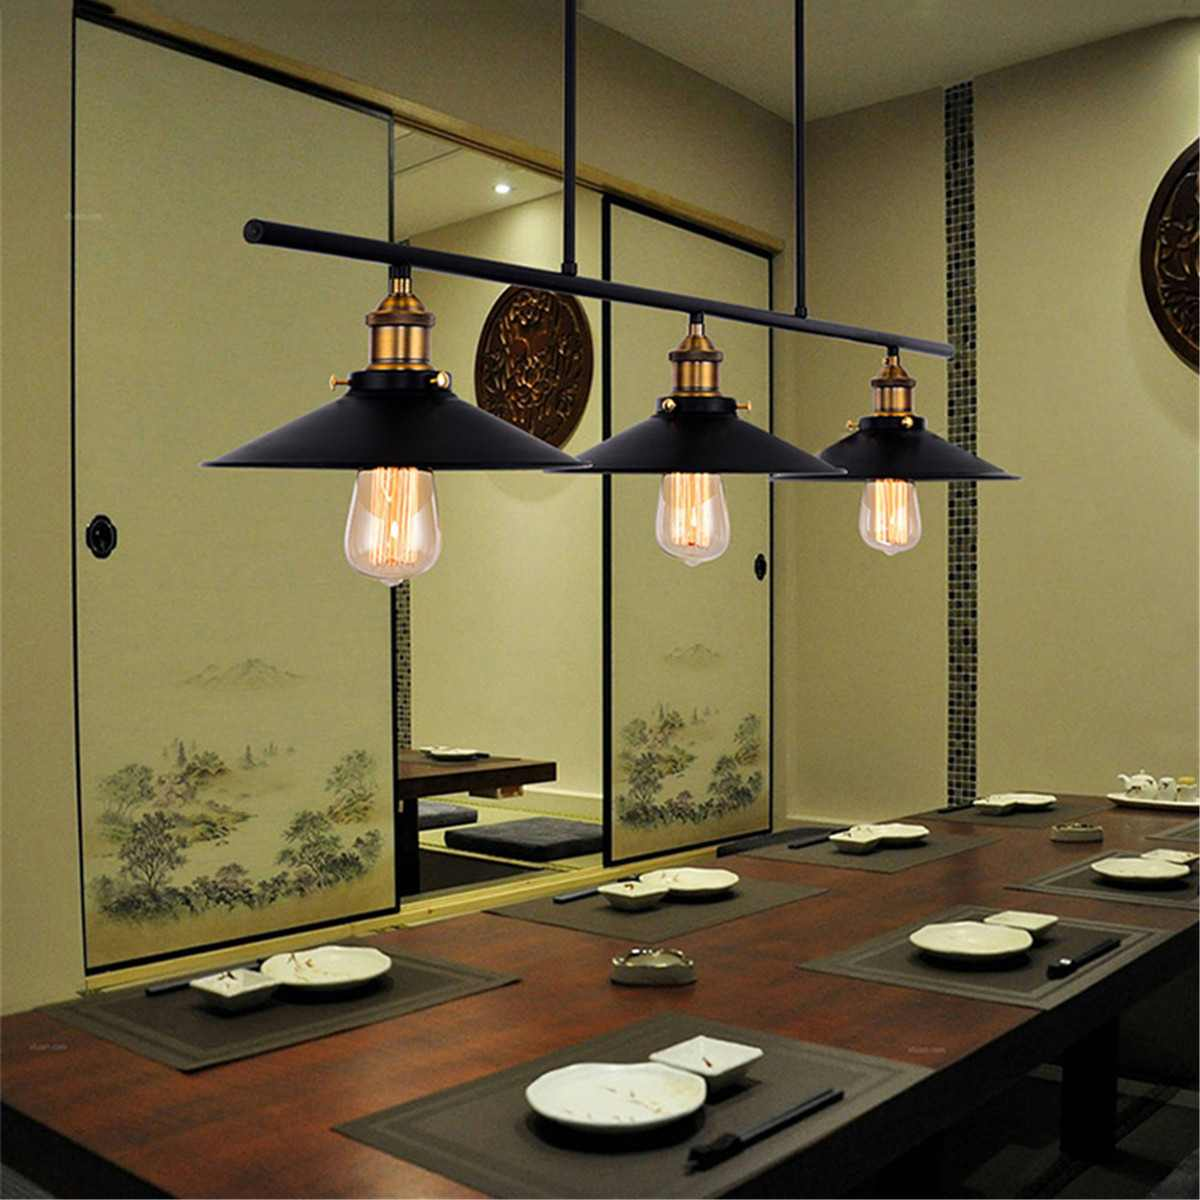 Loft Retro DIY Industrial Iron Pipe Vintage Ceiling Light Pendant Lamp Bar Decor